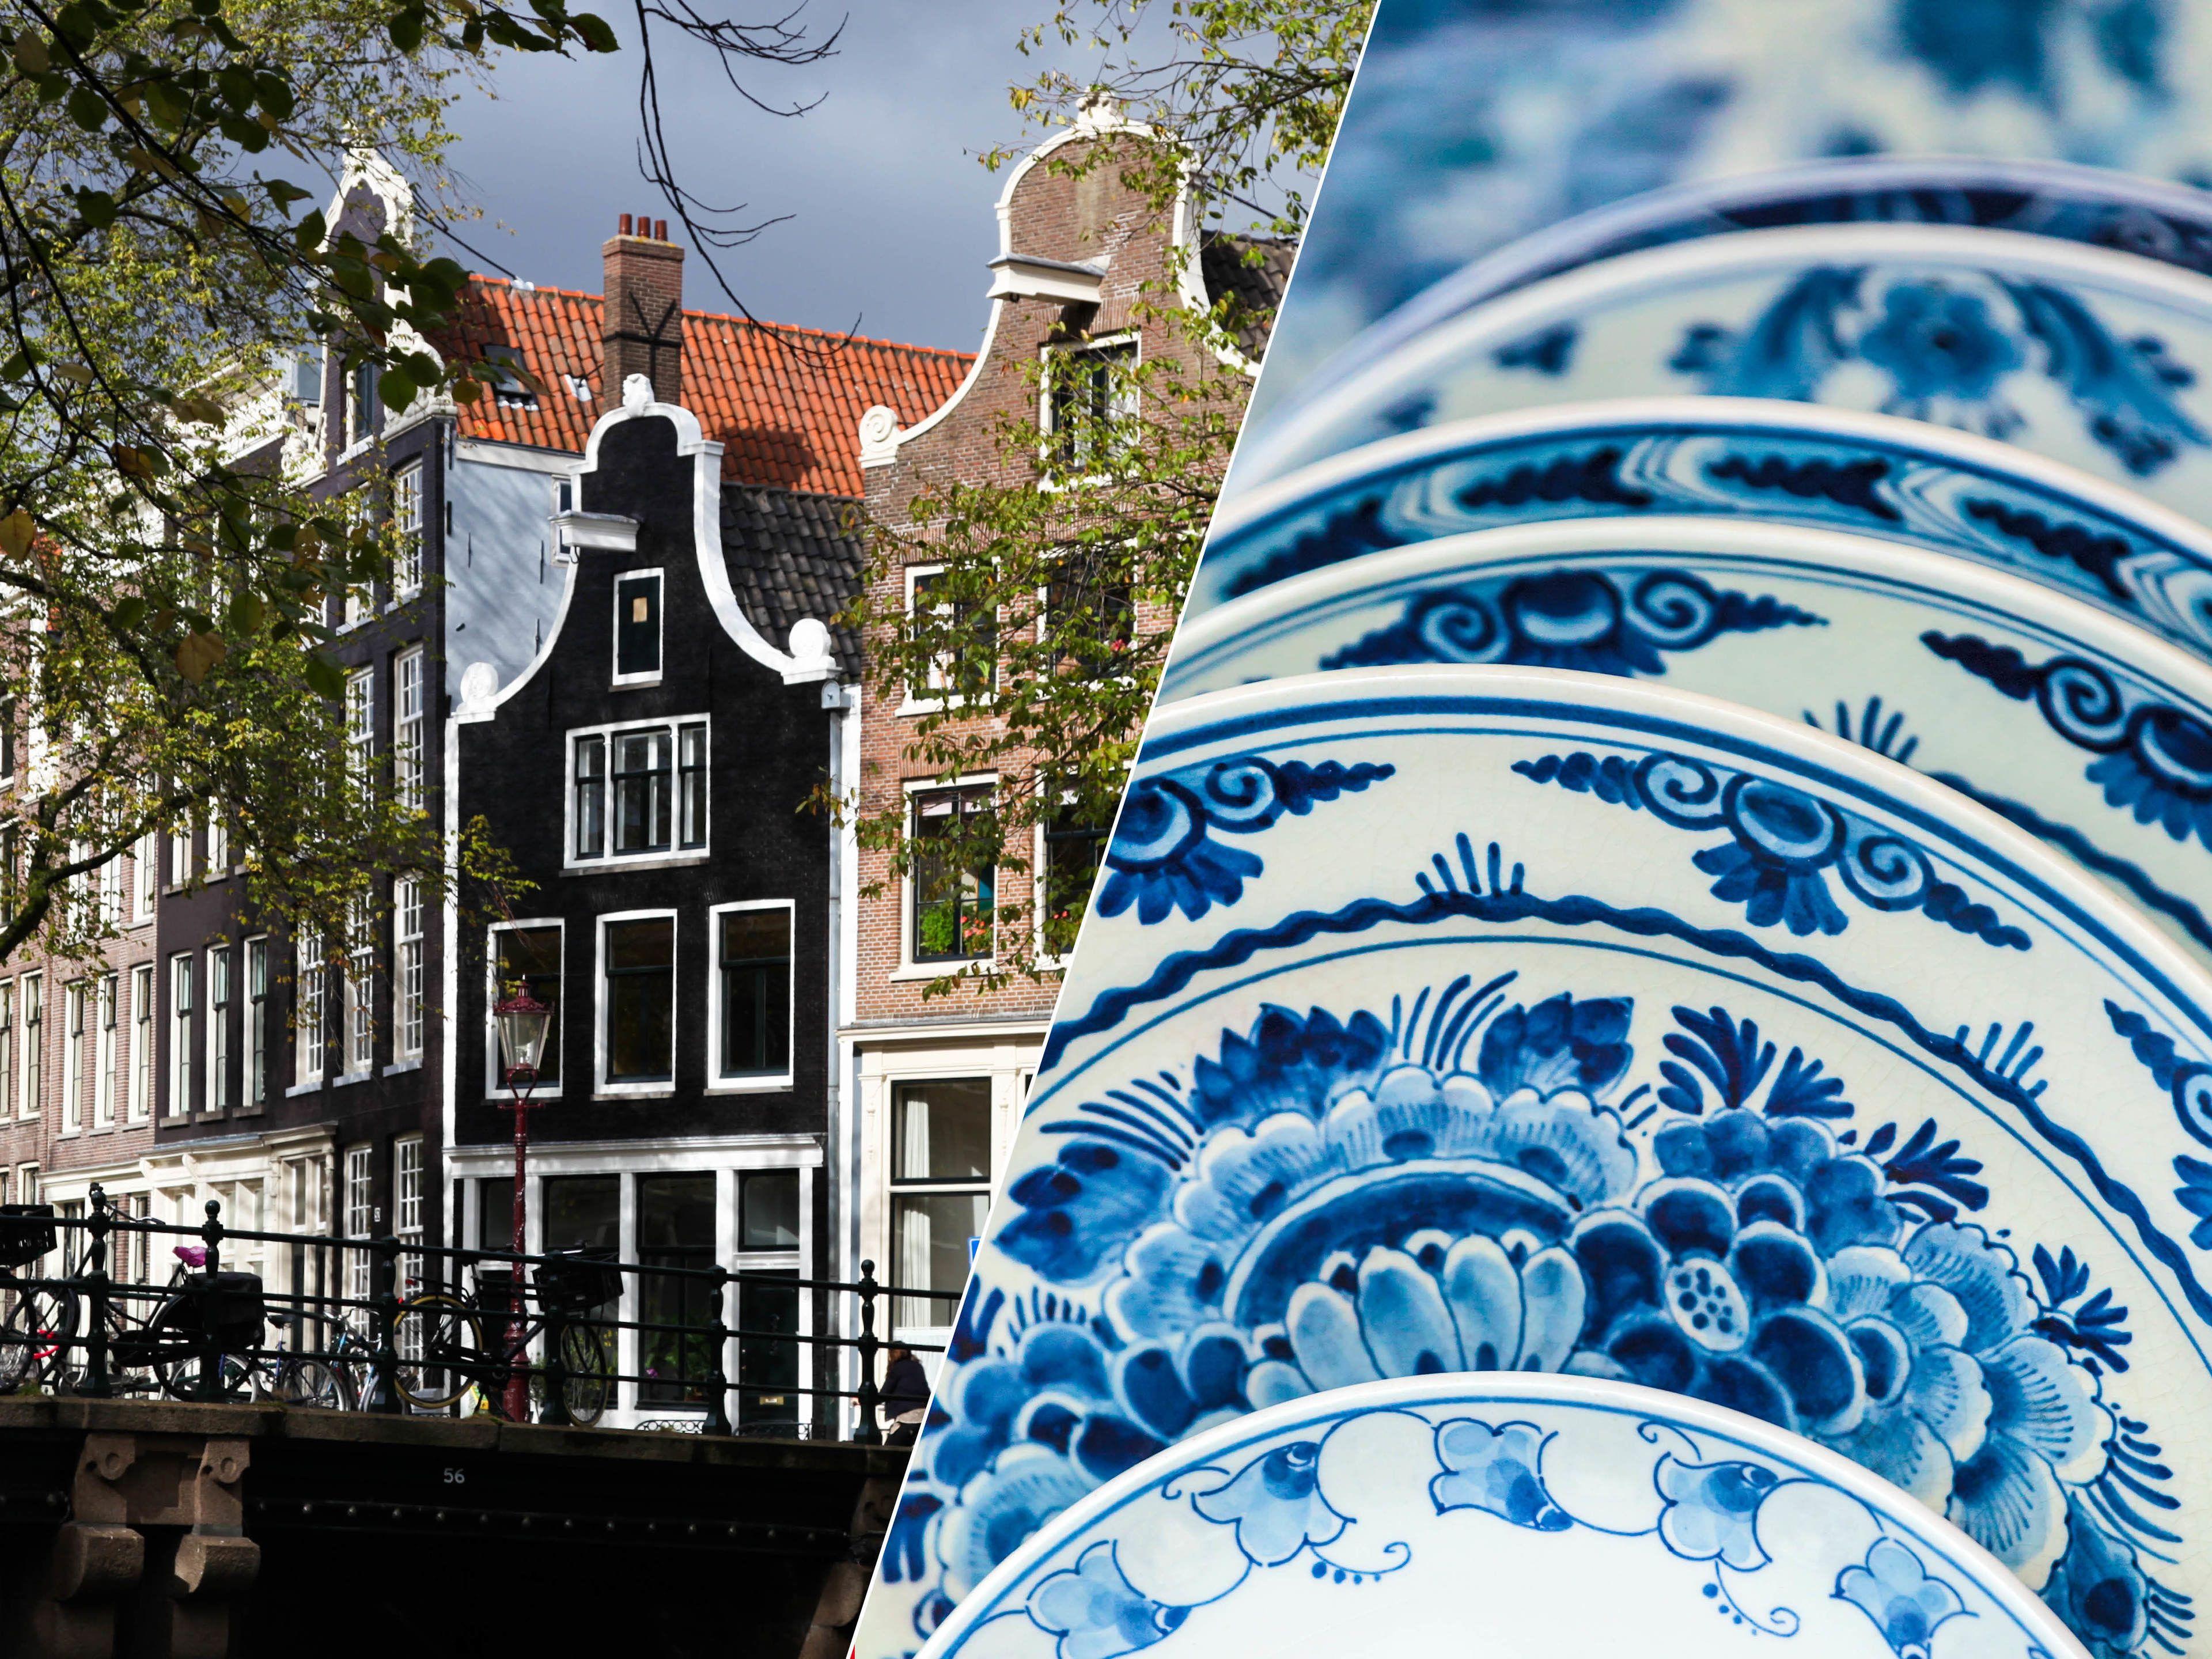 Combo Saver: City Sightseeing, Delft, The Hague & Madurodam Tour